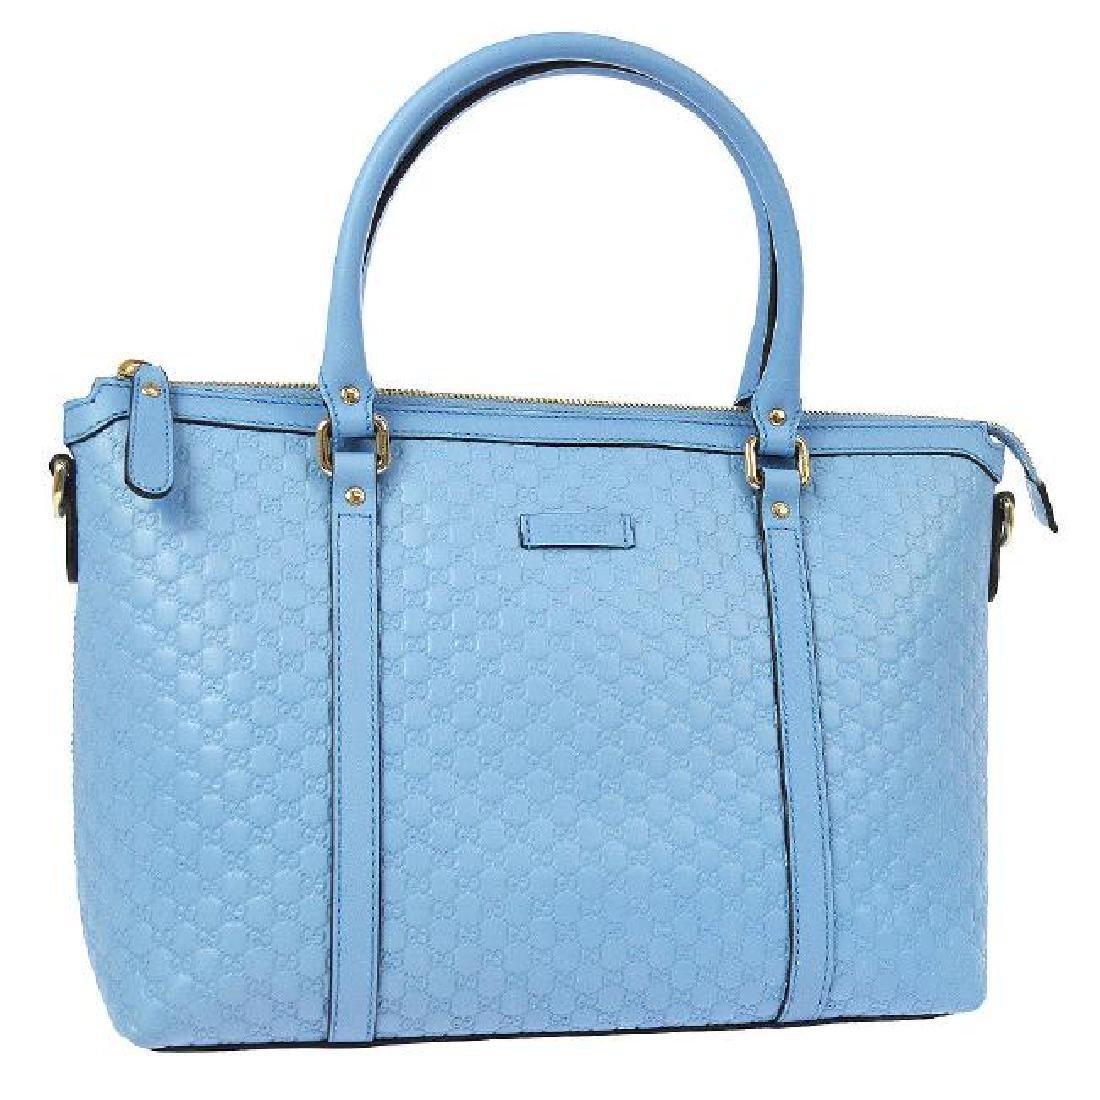 Vintage Gucci GG Pattern 2way Handbag: Light Blue